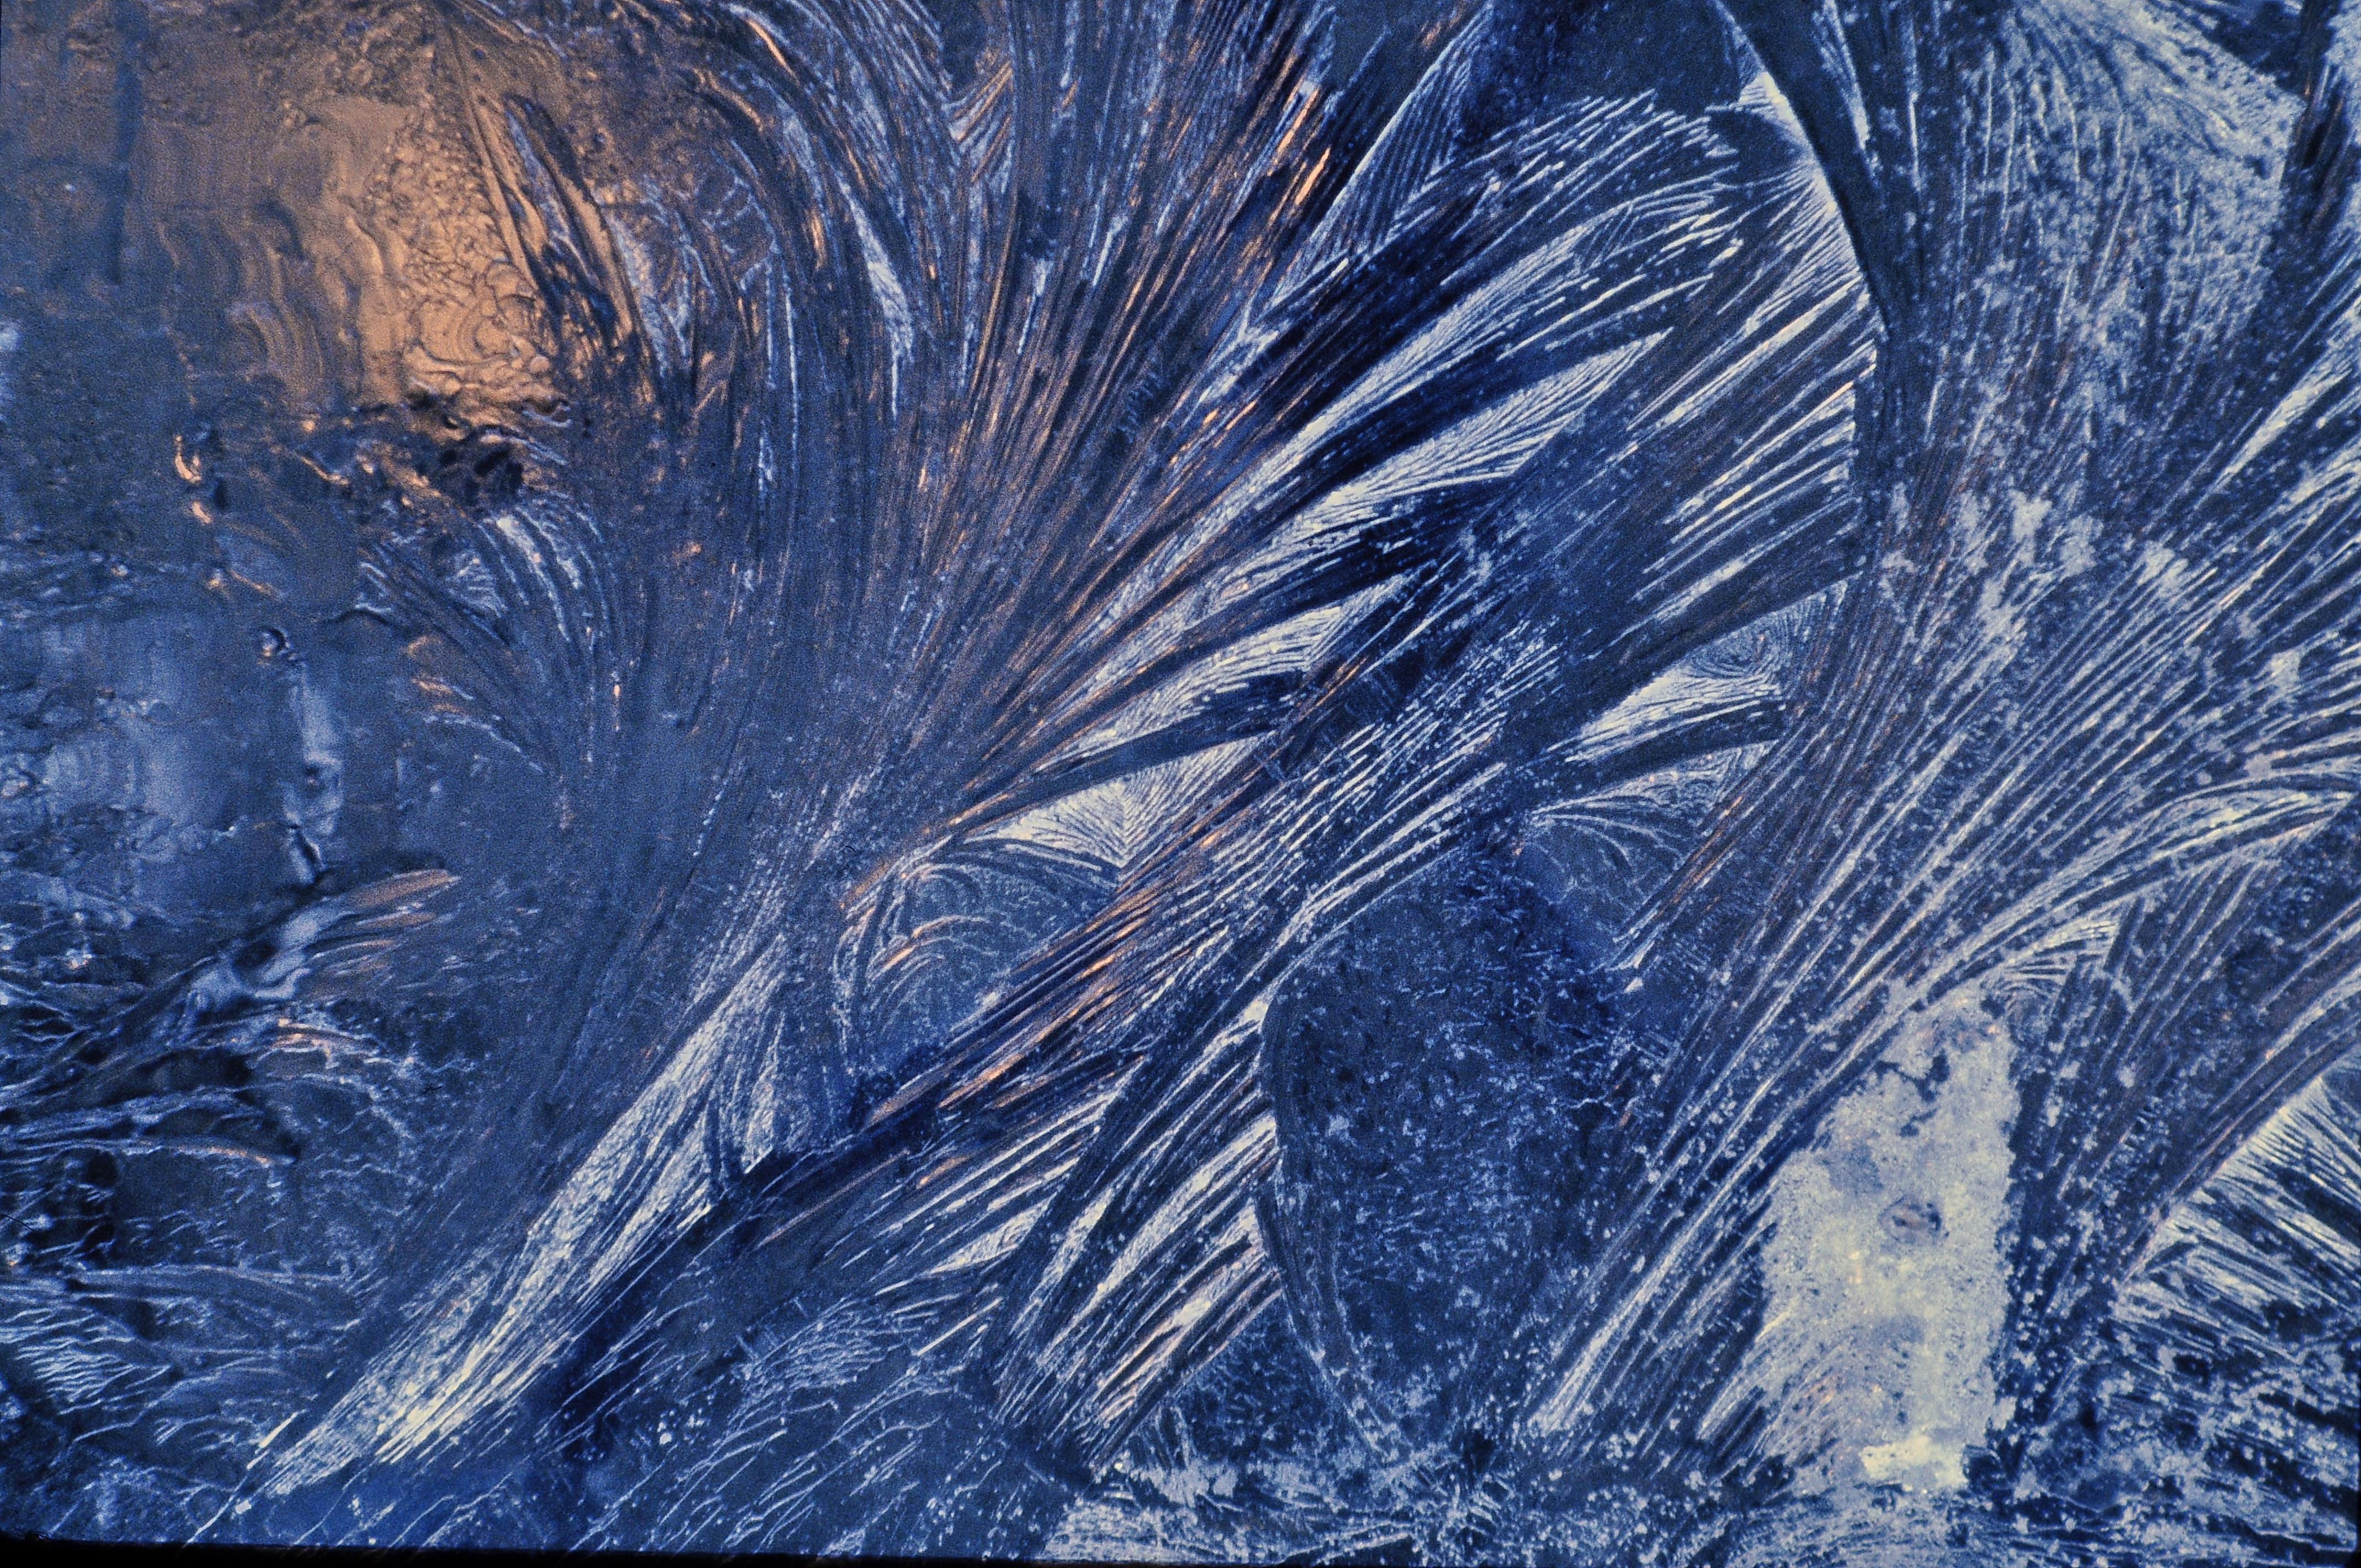 File:Frost patterns 5.jpg - Wikimedia Commons